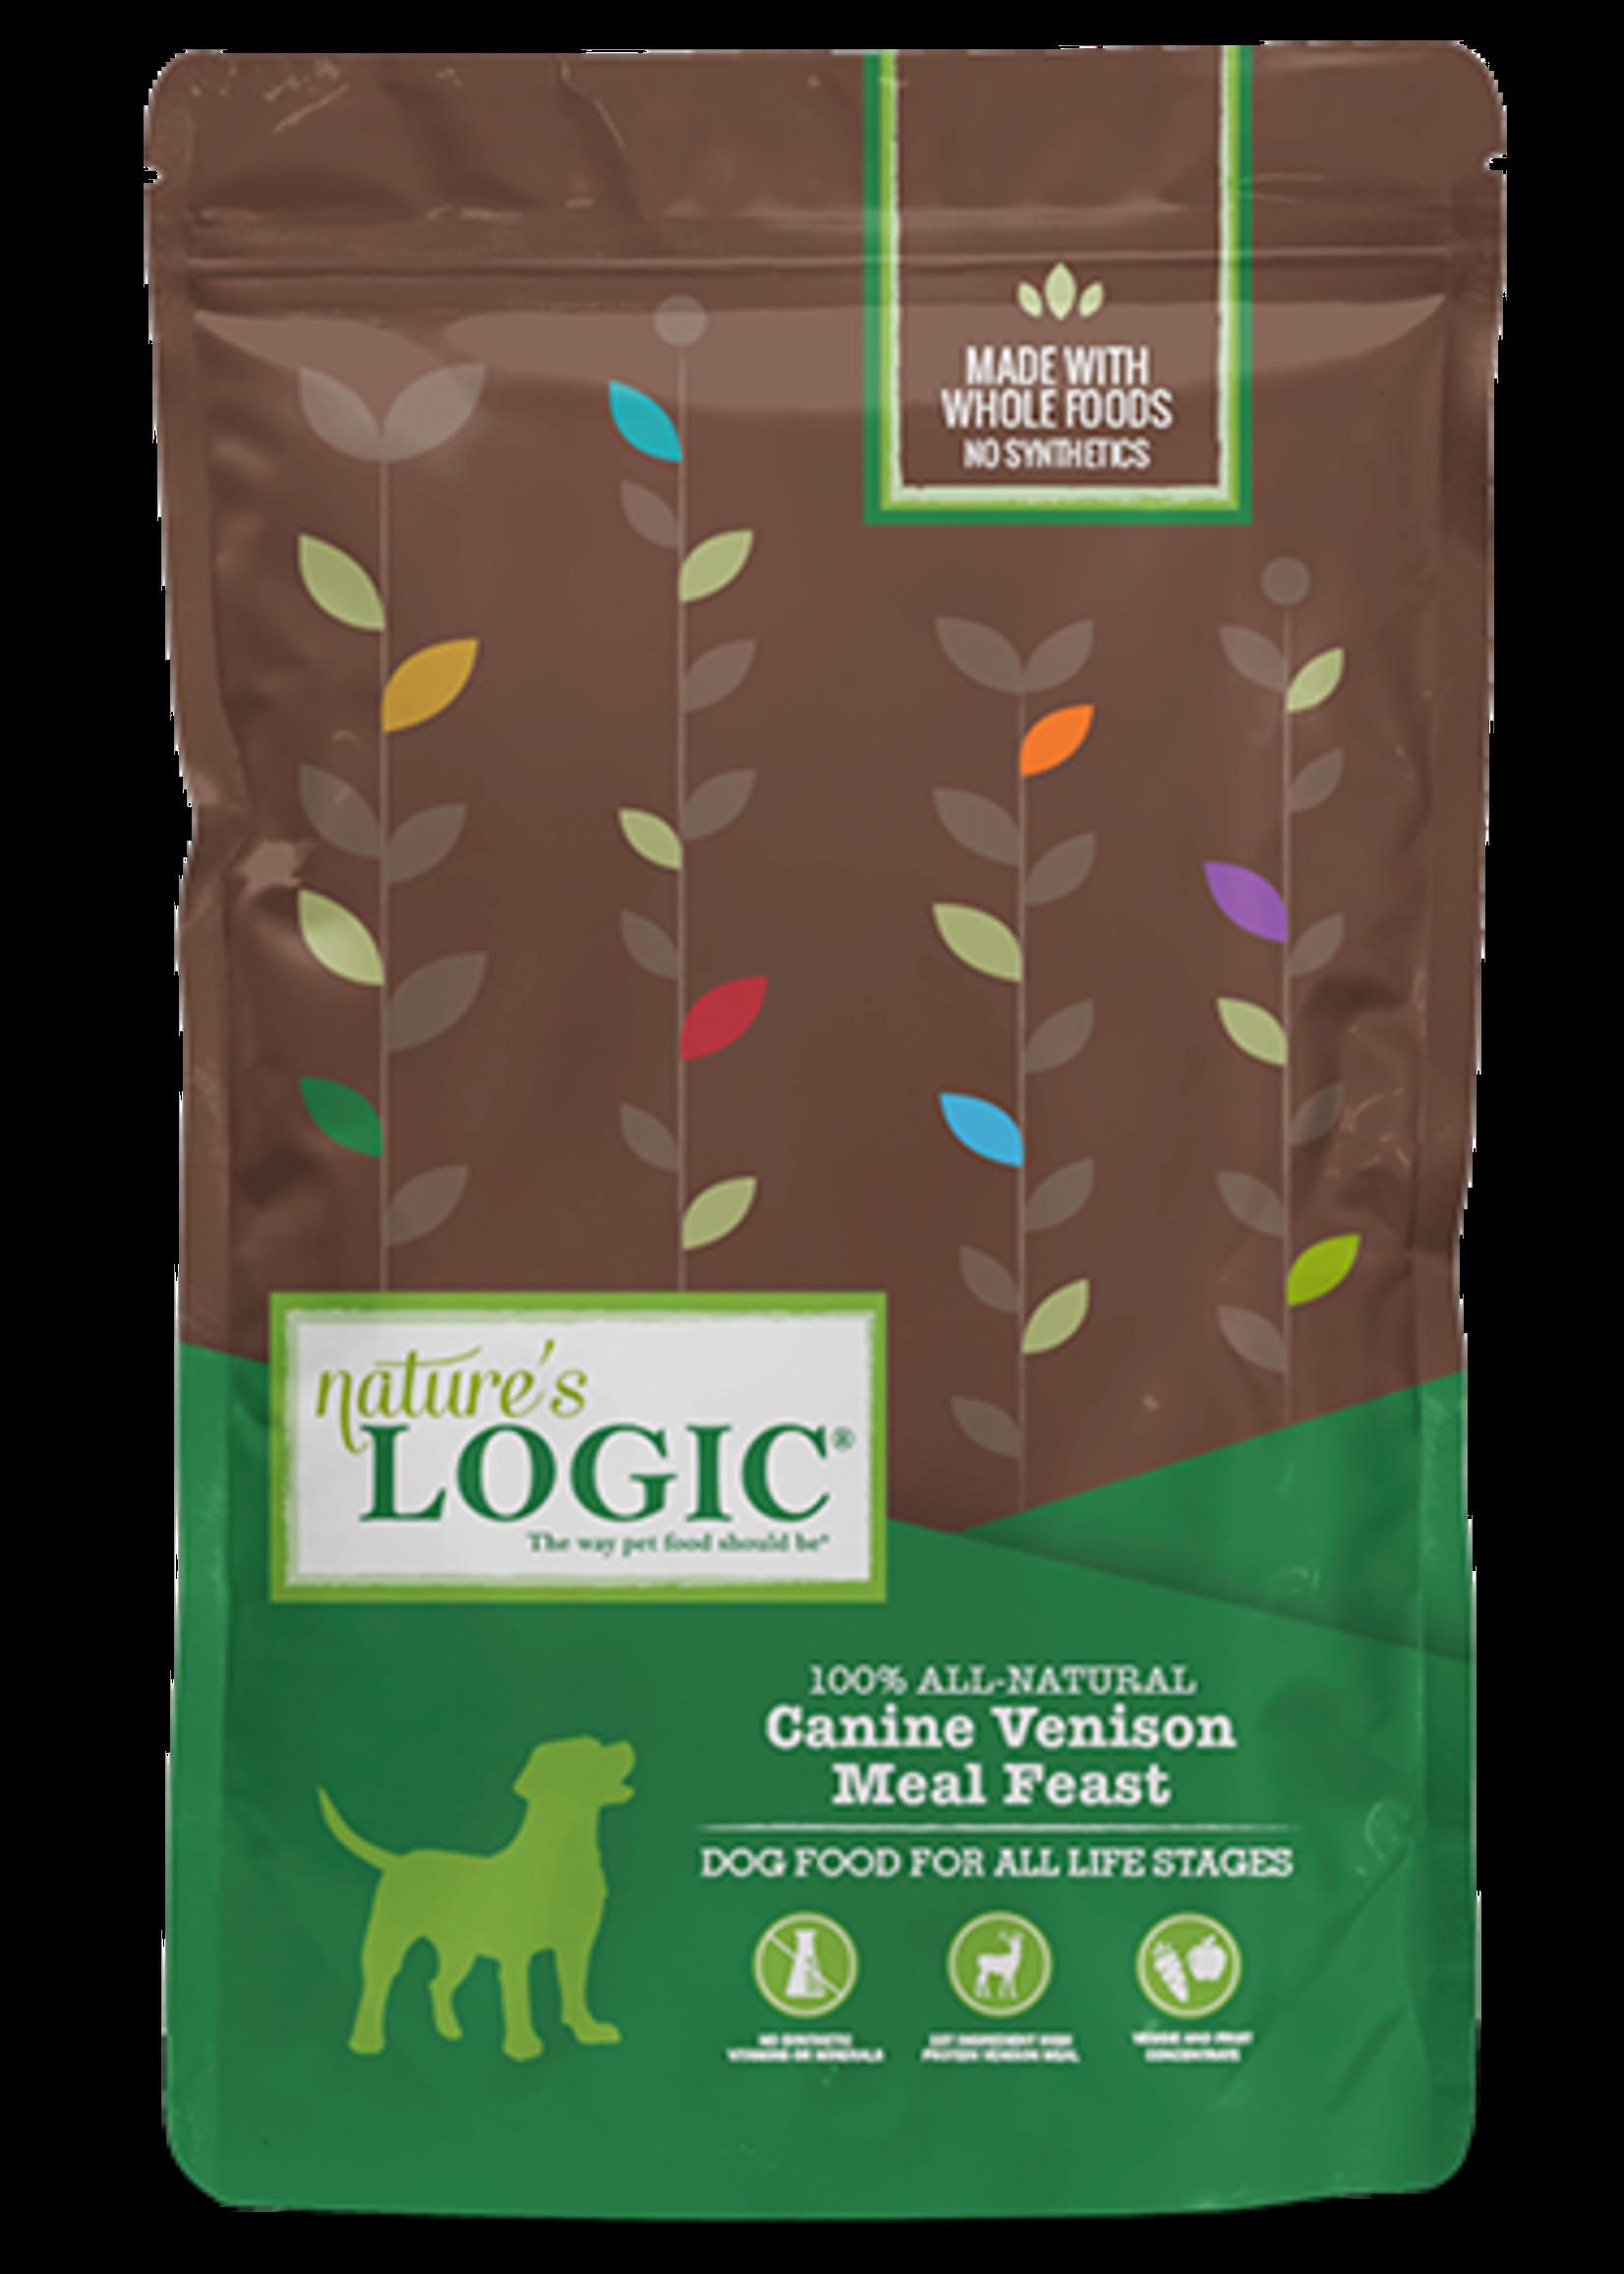 Nature's Logic Nature's Logic Canine Venison Meal Feast Dry Dog Food 4.4lbs